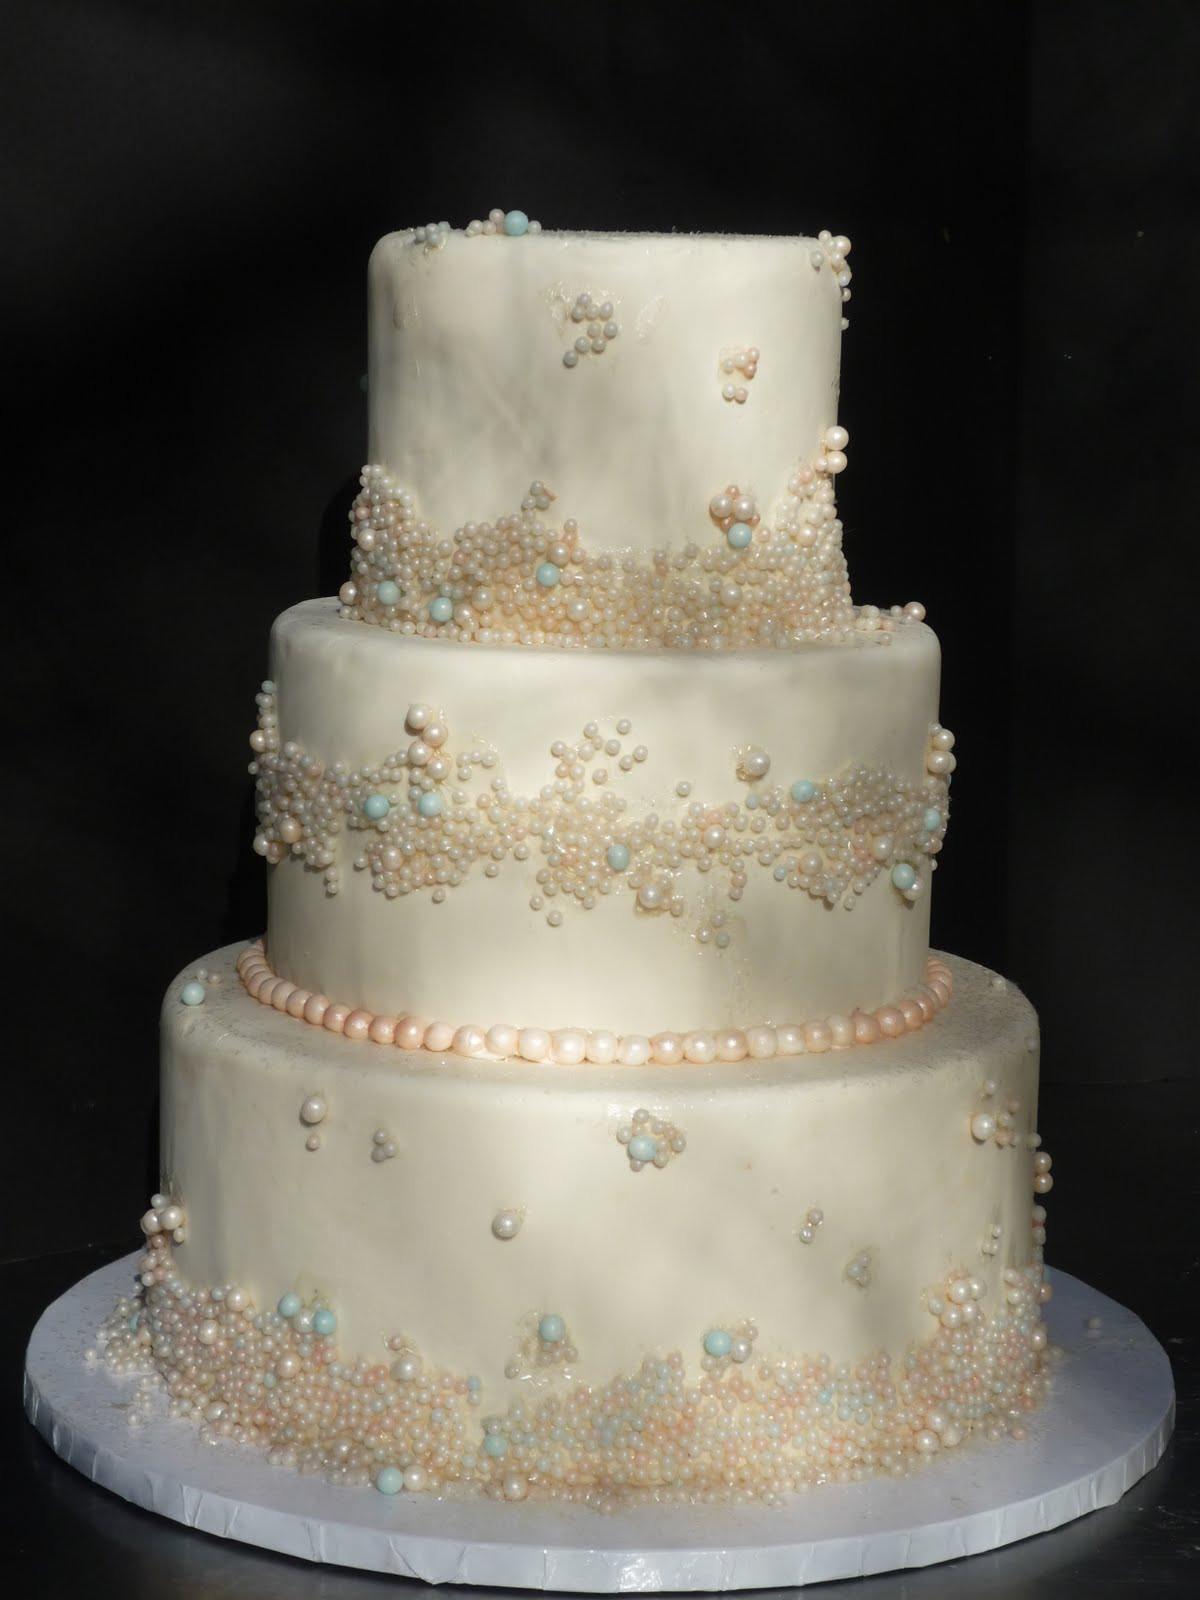 Wedding Cakes Pearls  Artisan Bake Shop Wedding Cake Fondant Tiers with Pearls